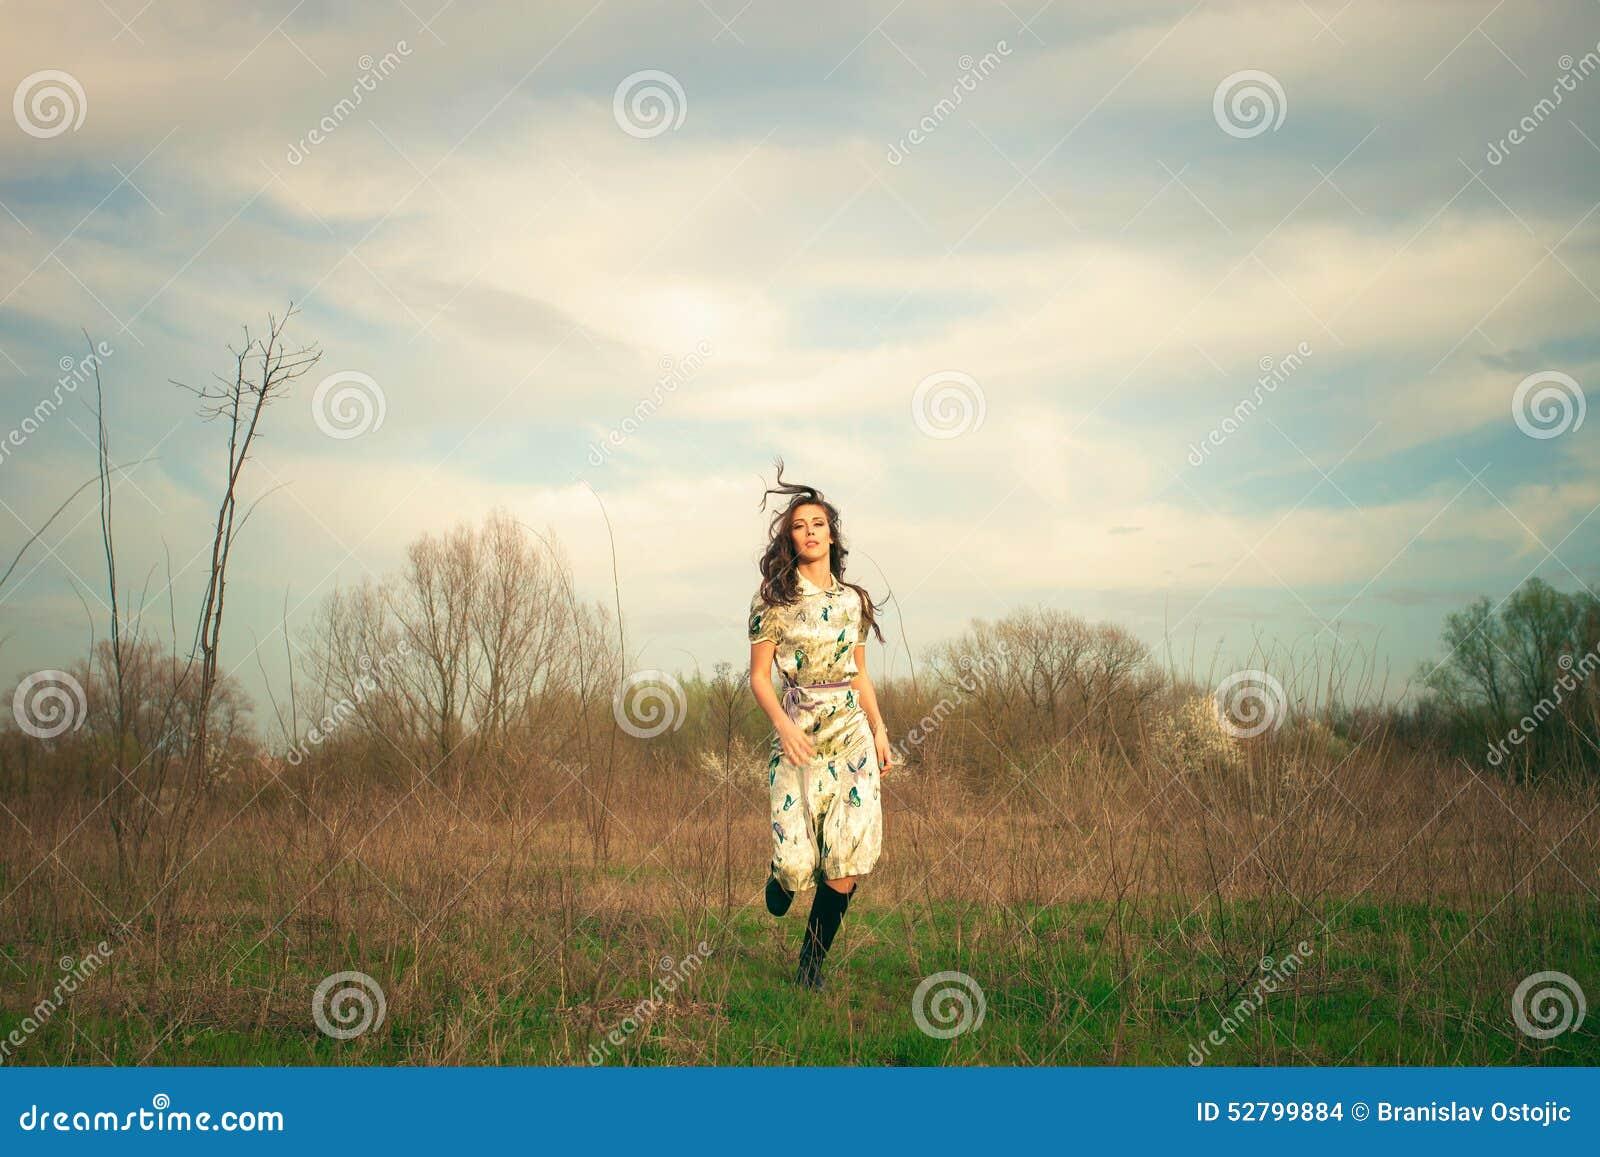 Run across the field